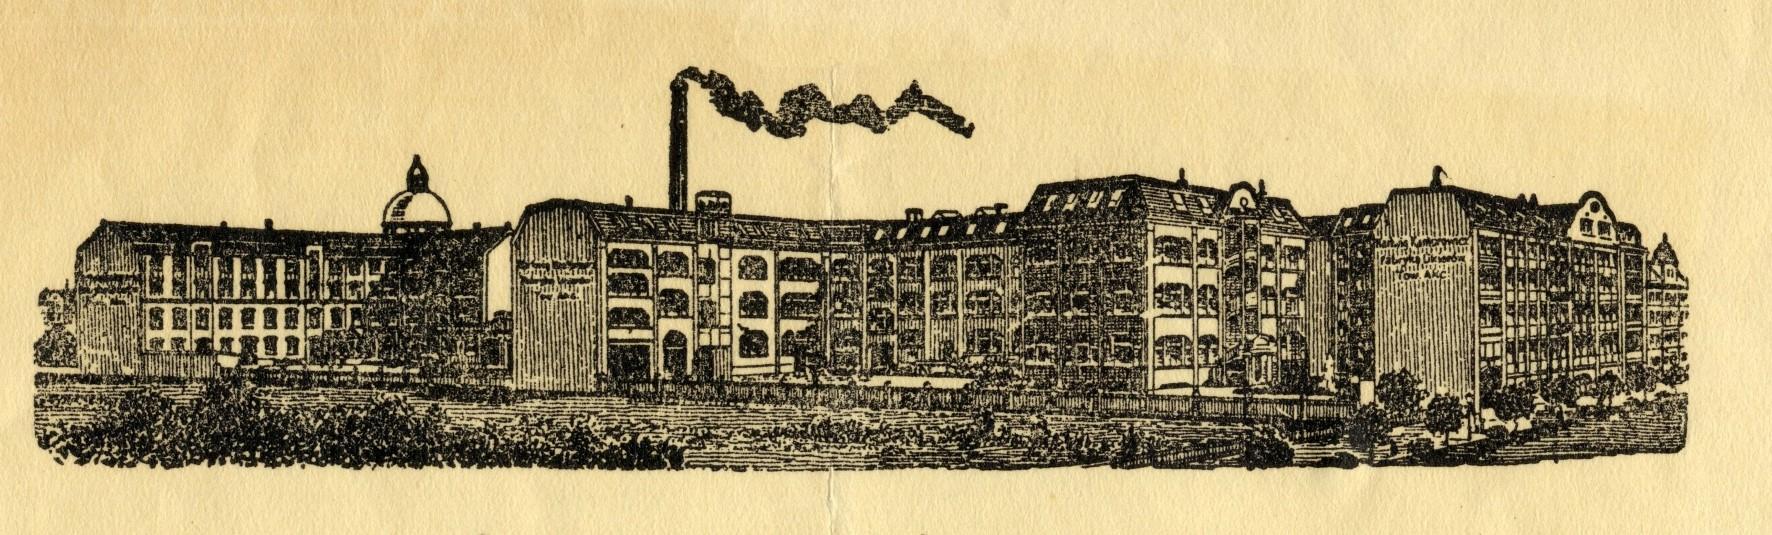 Fabrikkomplex Grochowe Laki 6, ©Stephan Becker, Brüssow